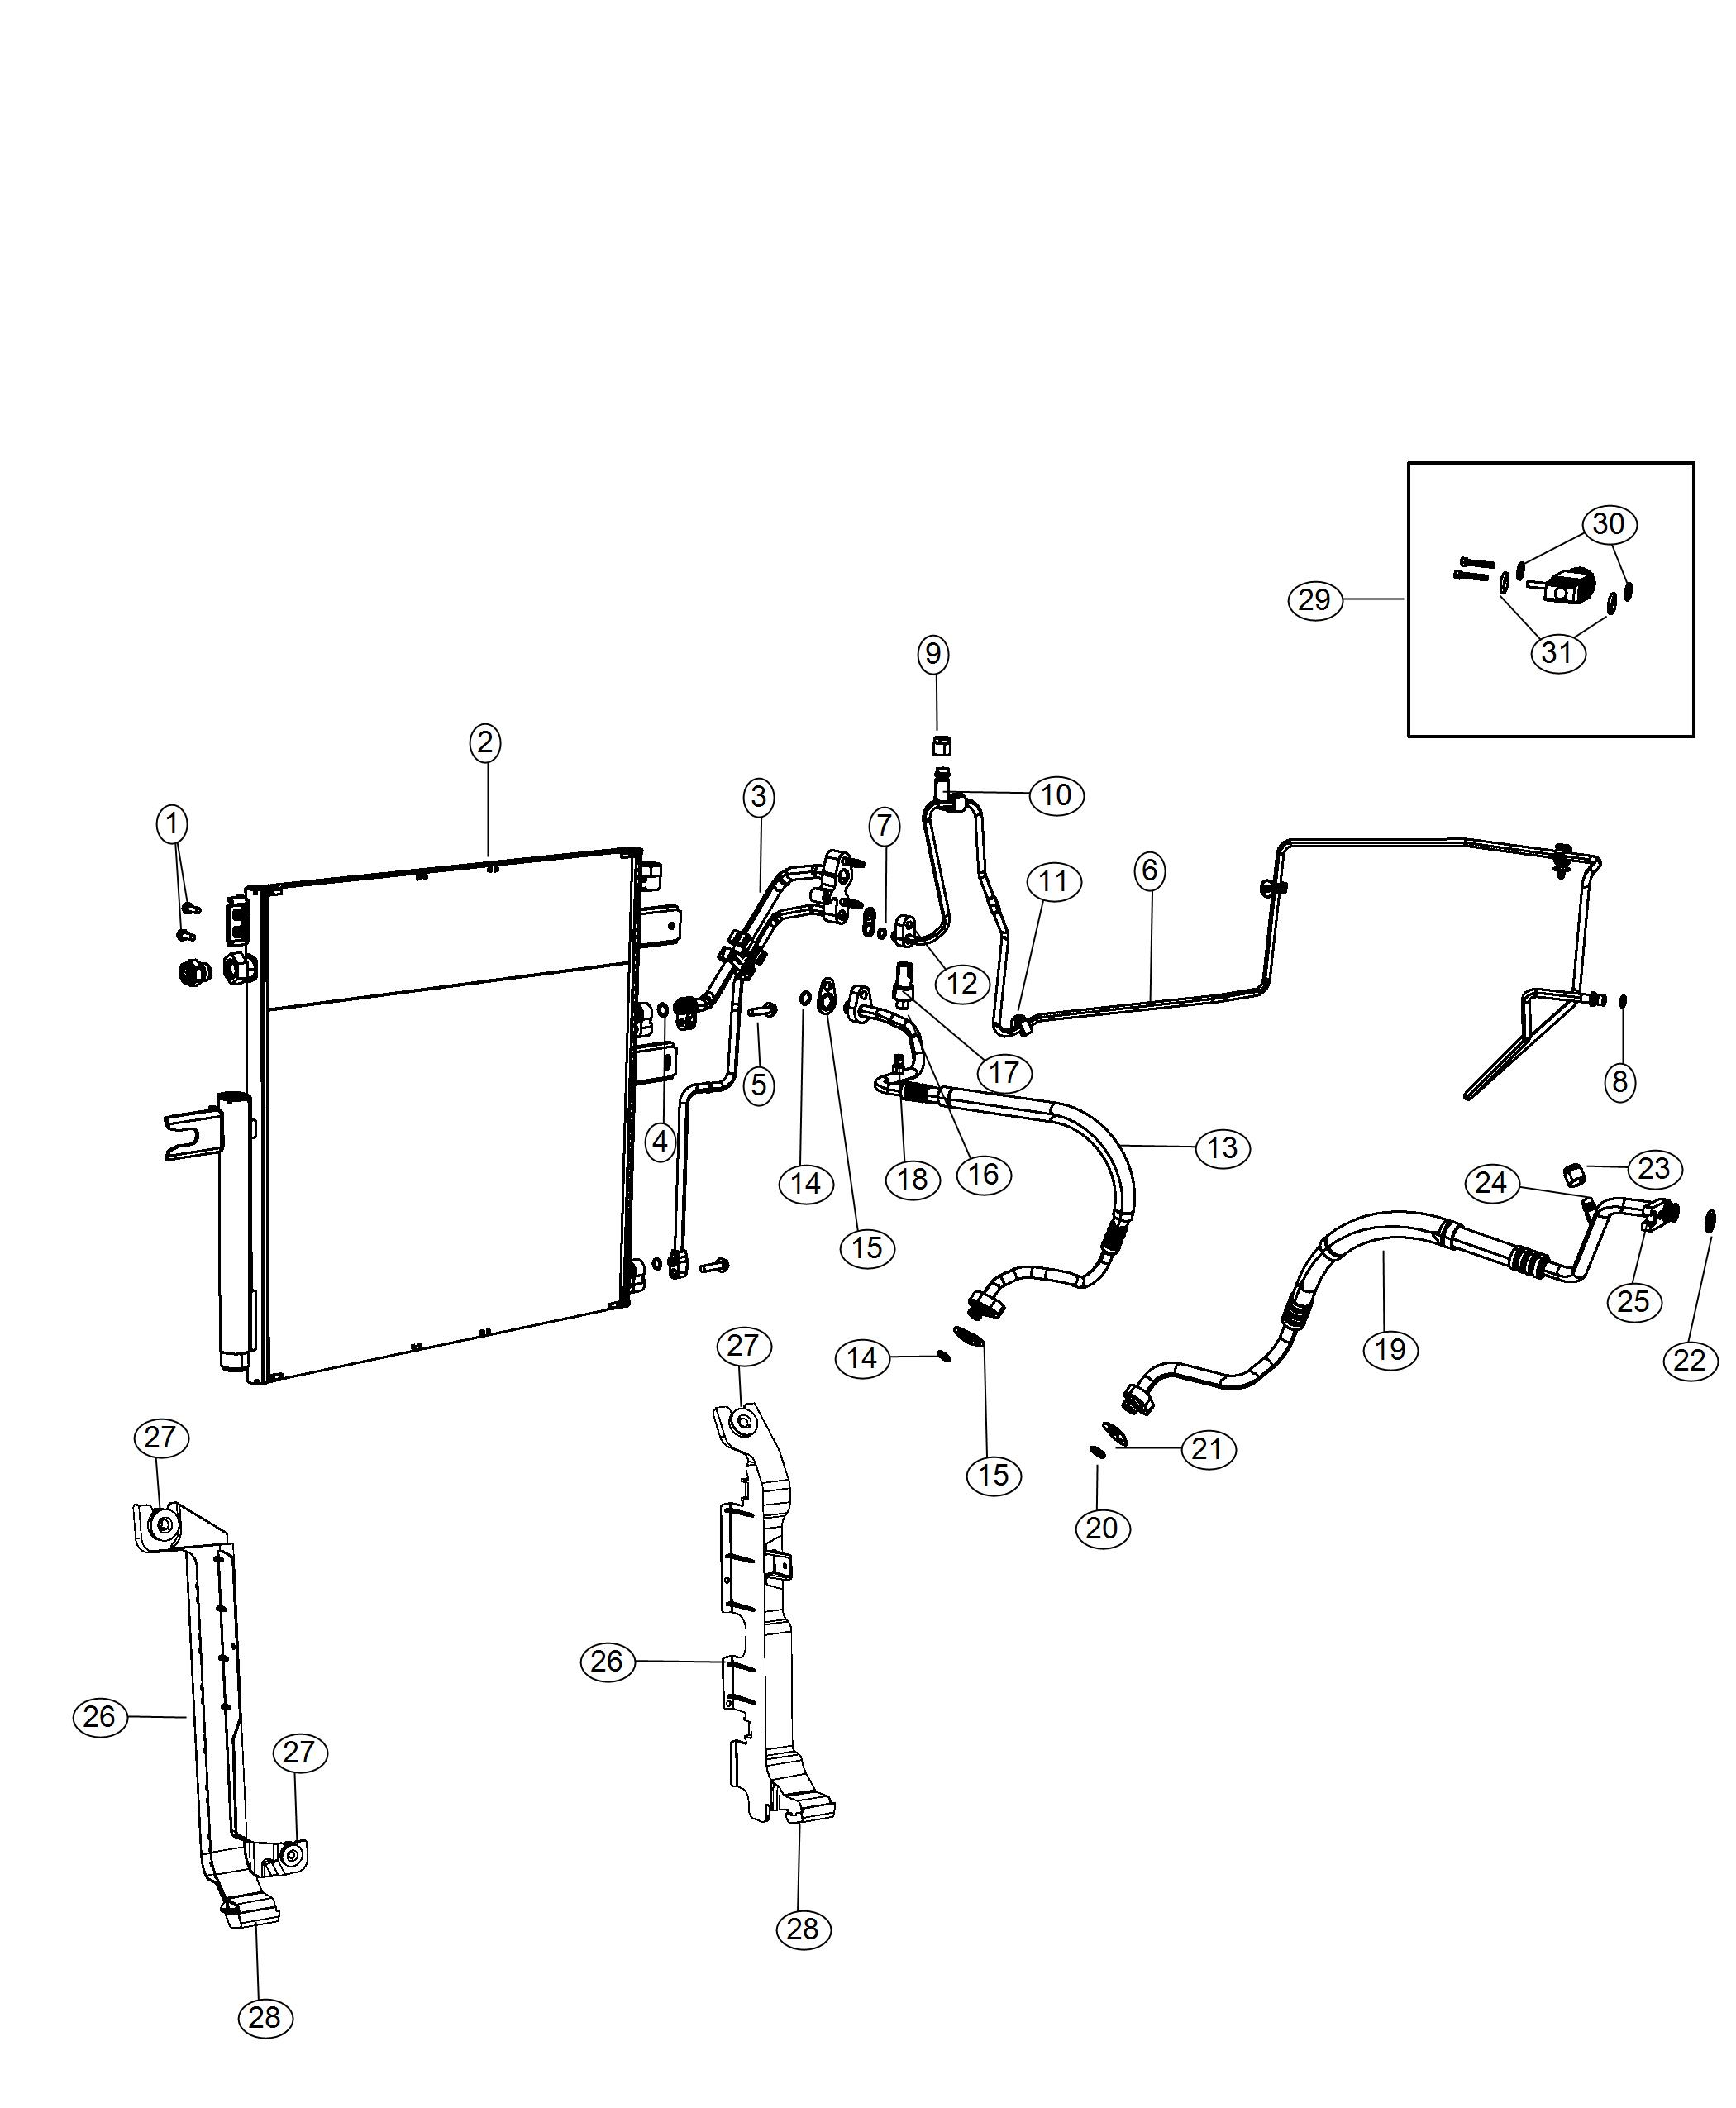 Ram Bracket Radiator To Condenser Right Front